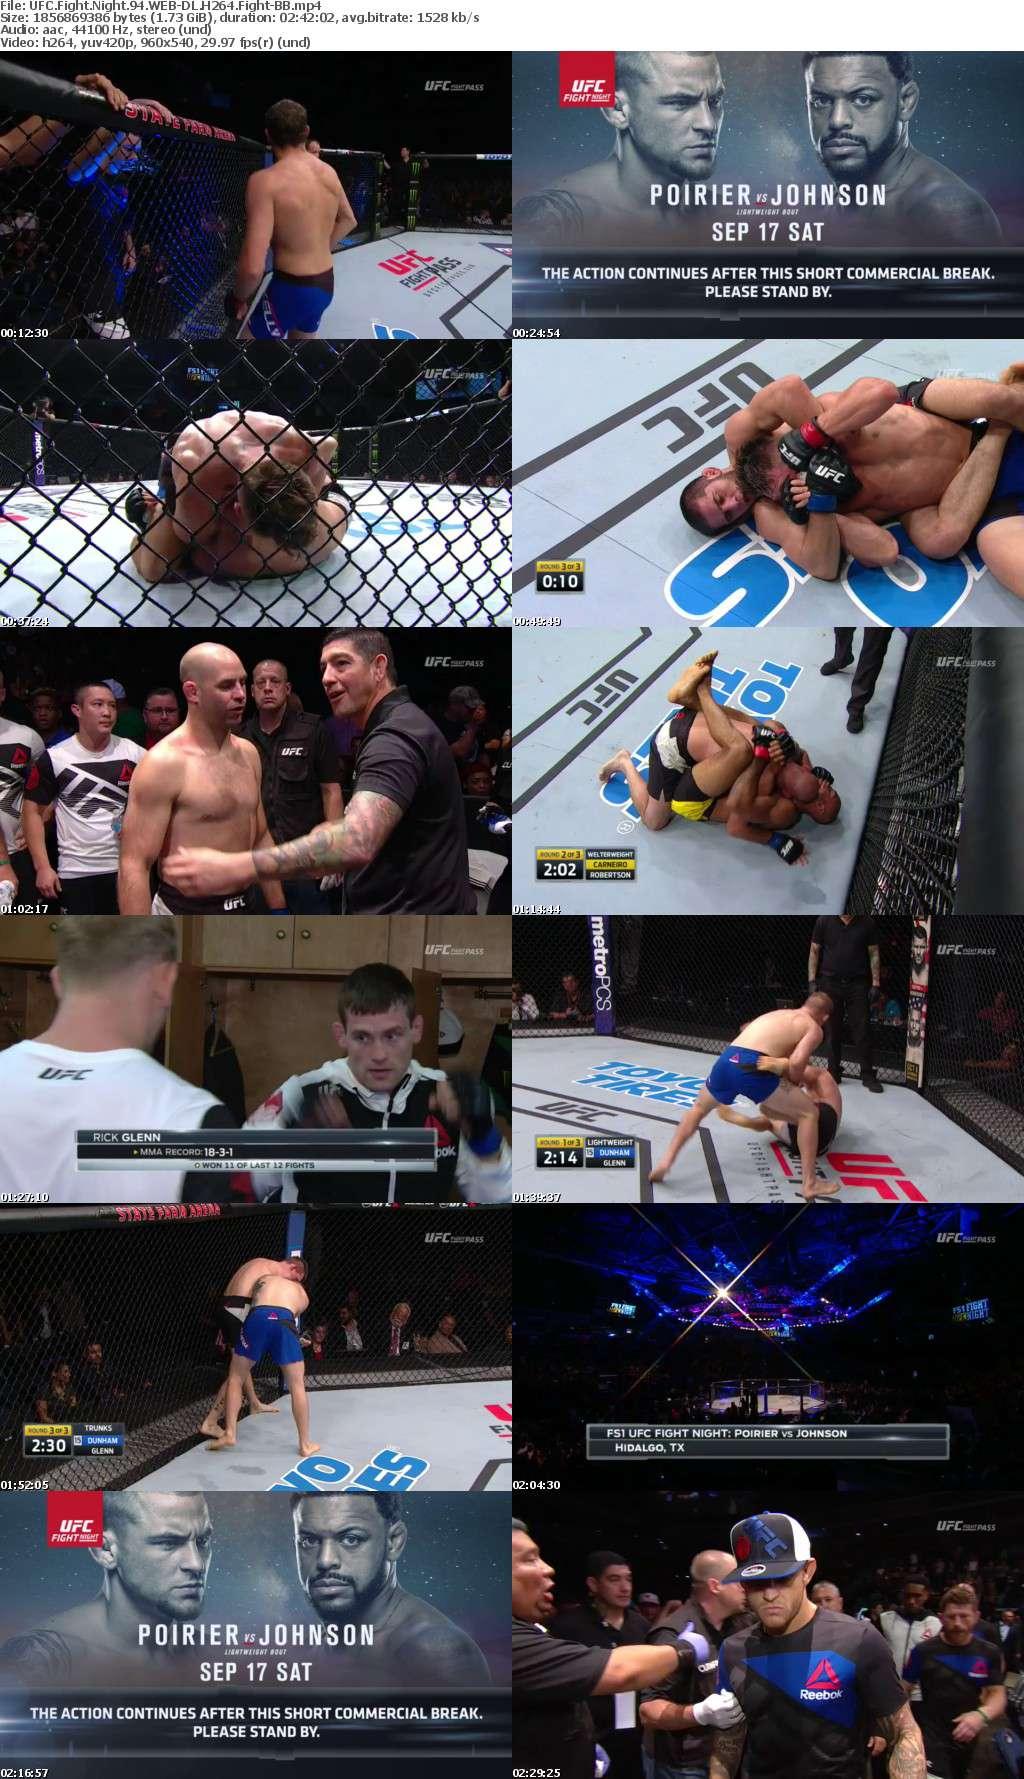 UFC Fight Night 94 WEB-DL H264 Fight-BB